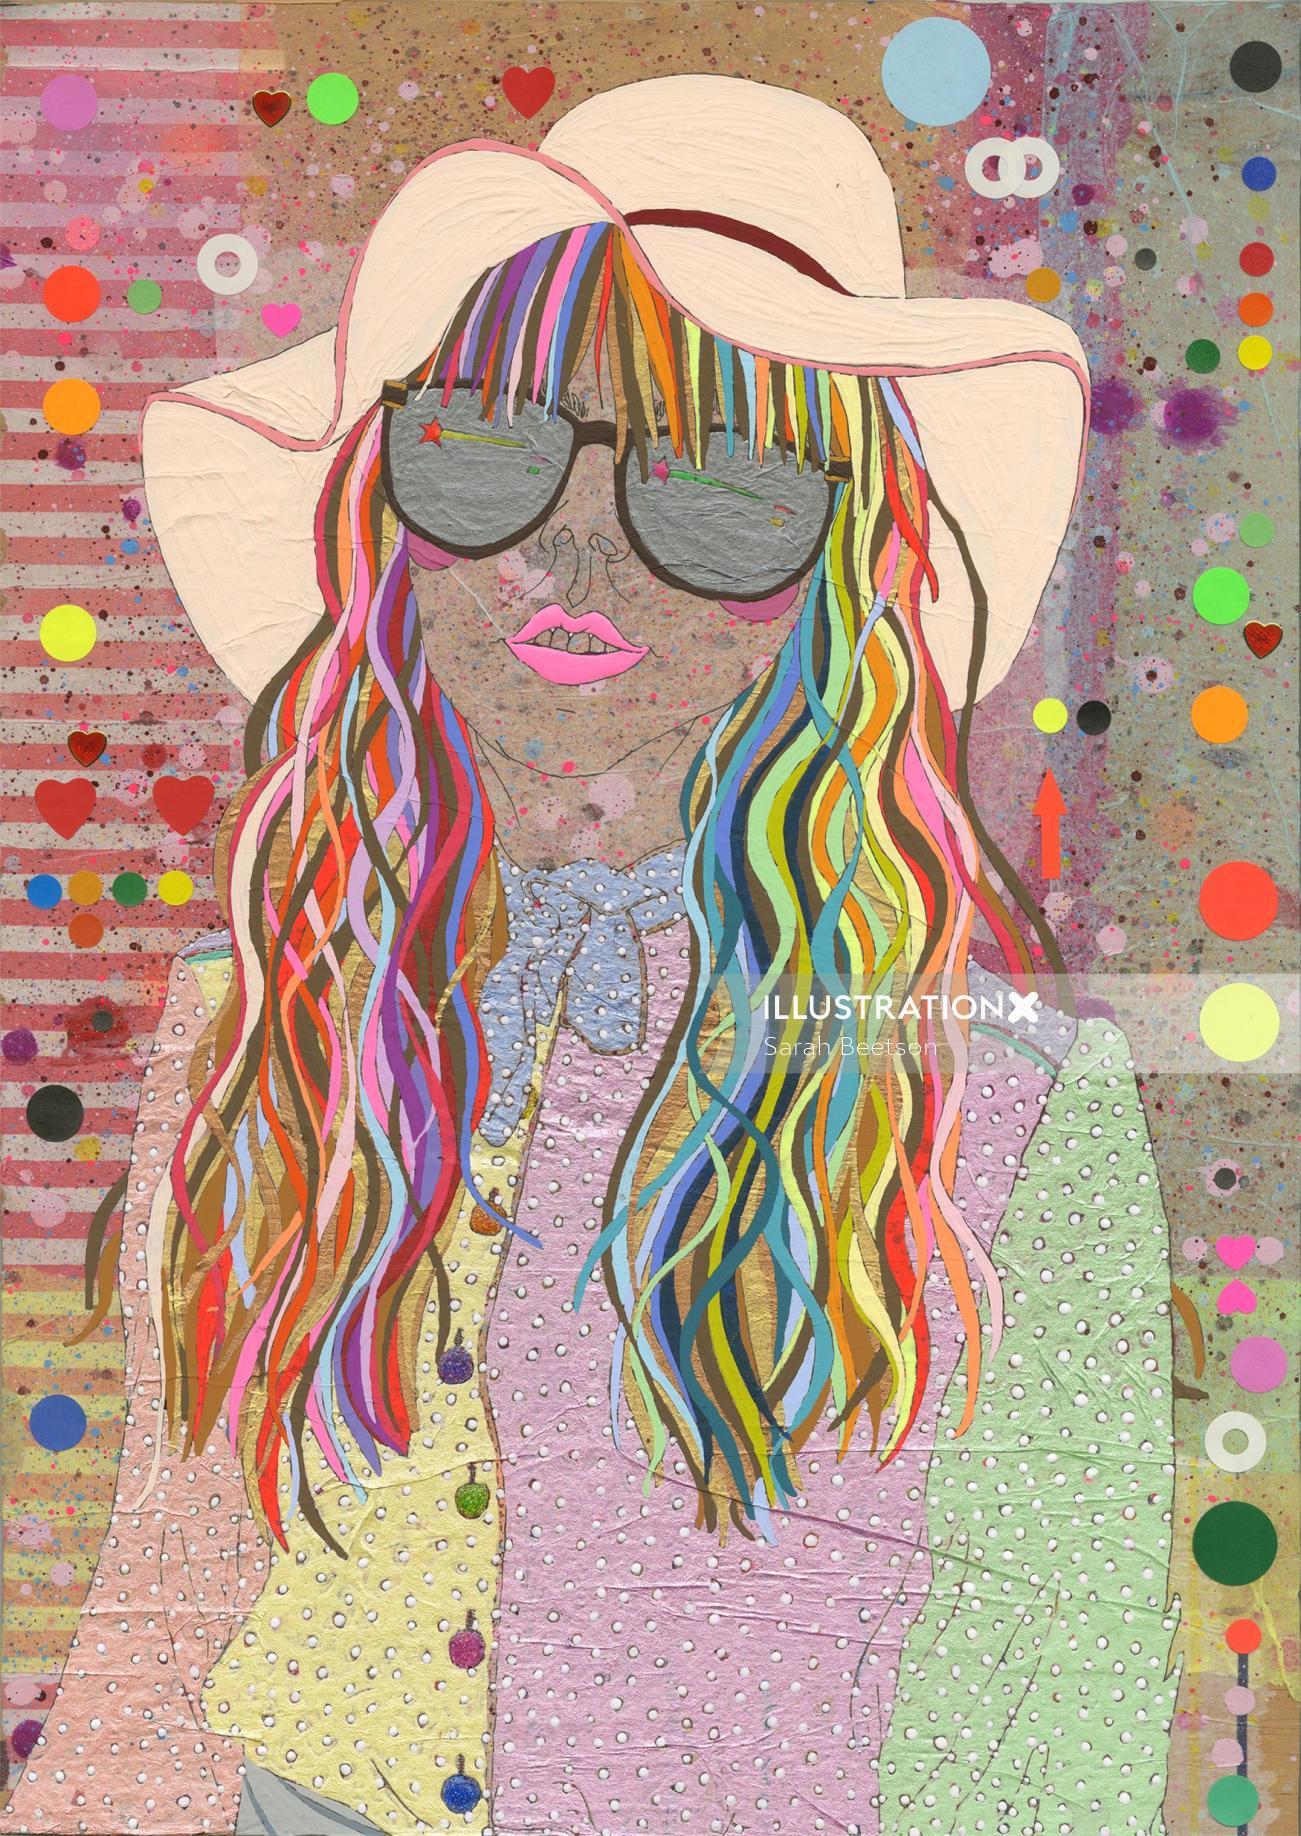 Fashion woman - Illustration by Sarah Beetson